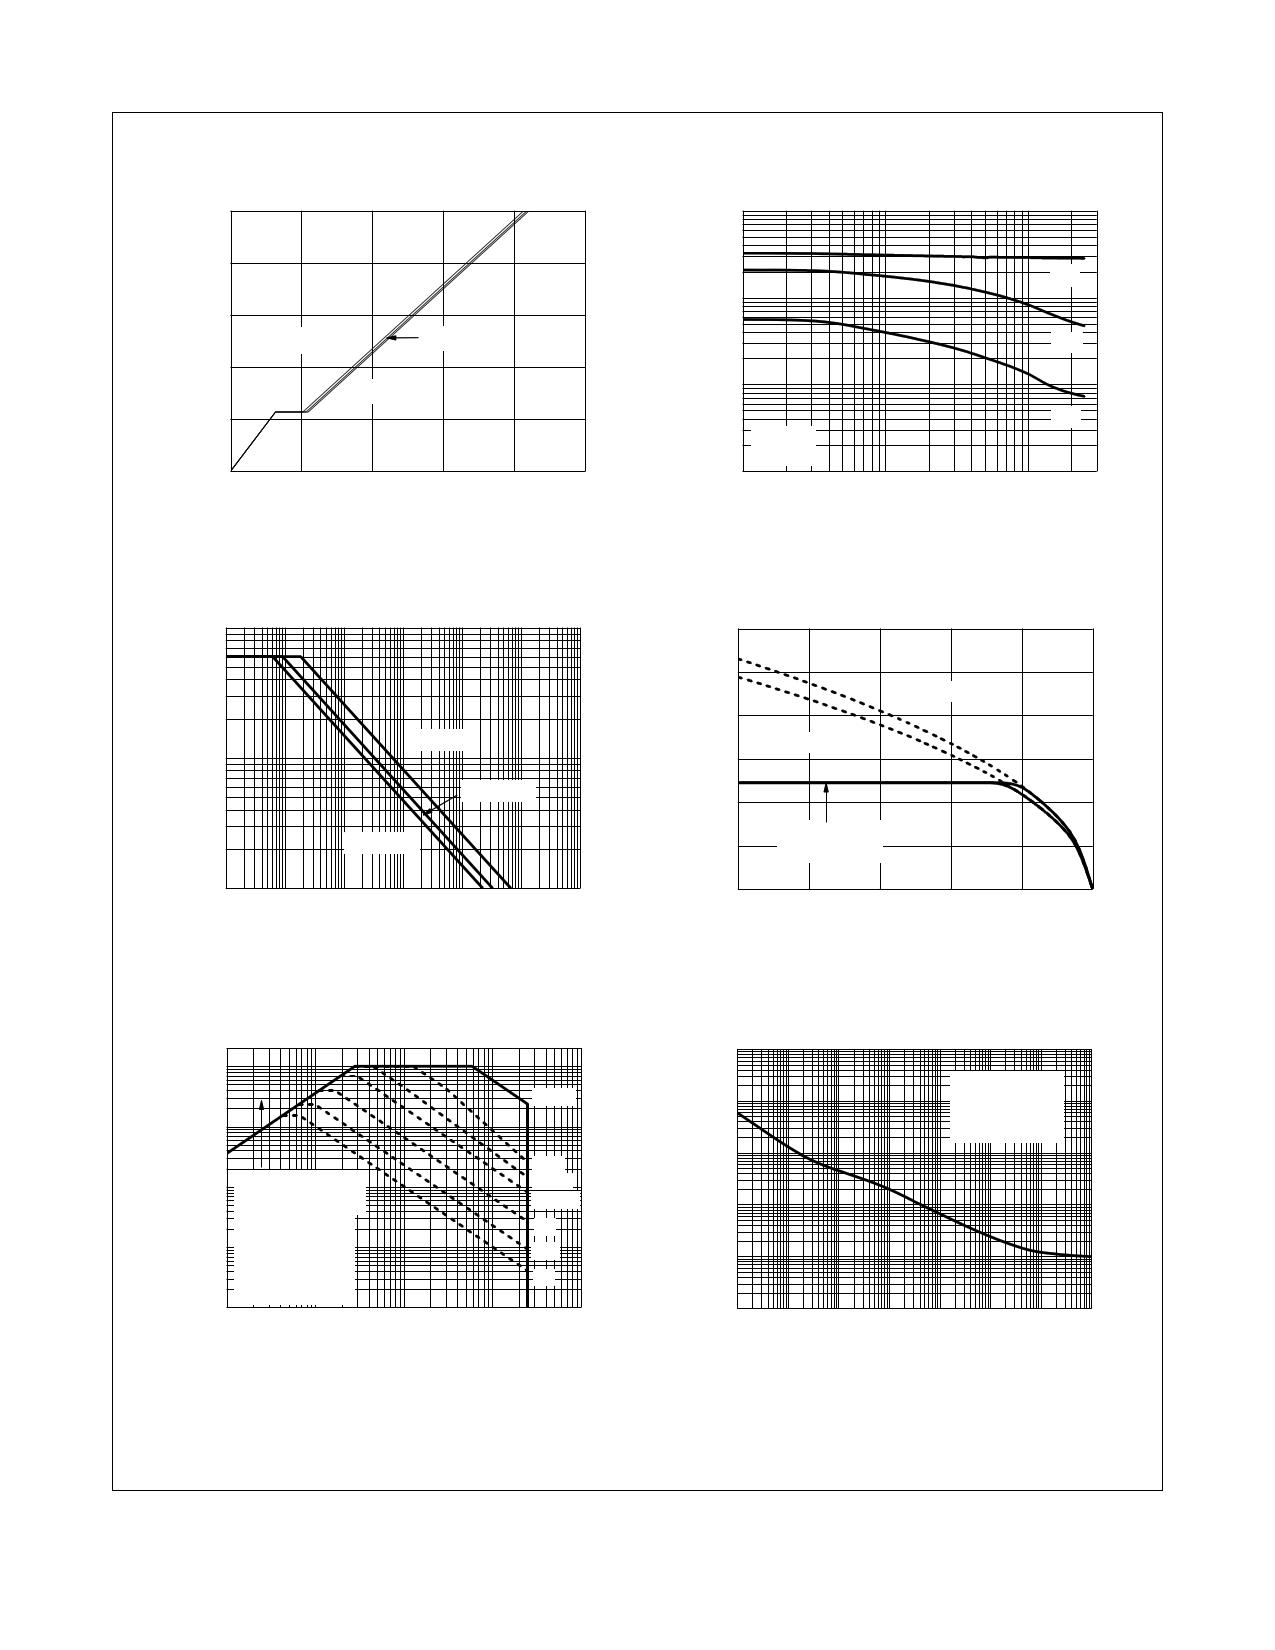 FDMS8570S pdf, 반도체, 판매, 대치품